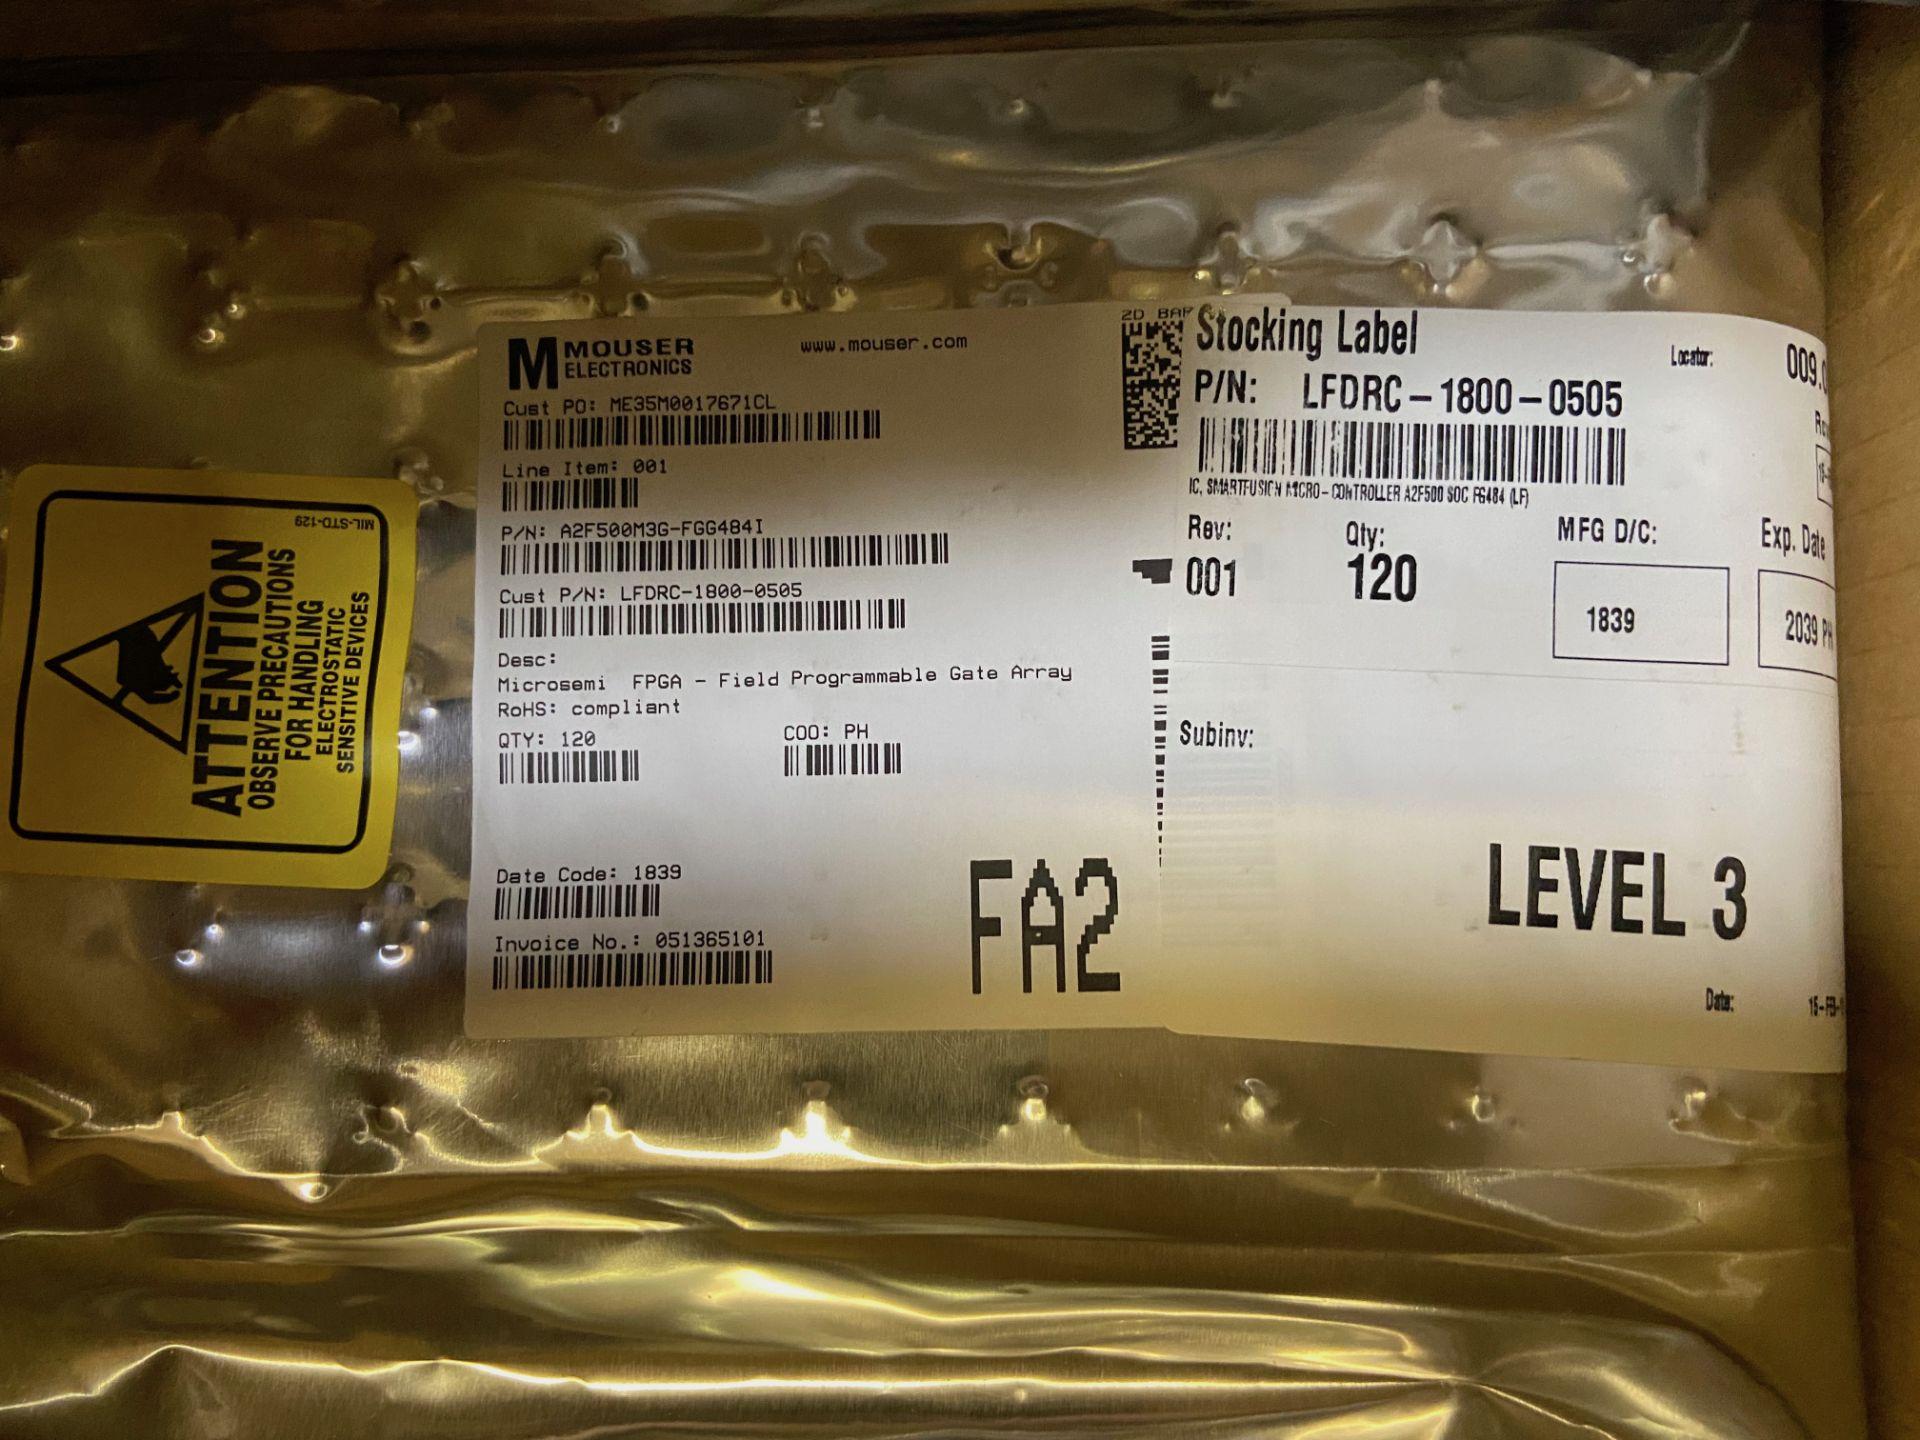 Microchip Technology SoC FPGA A2F500M3G-FGG484I, QTY 125, FPGA SmartFusion Family, 500K Gates, - Image 3 of 6